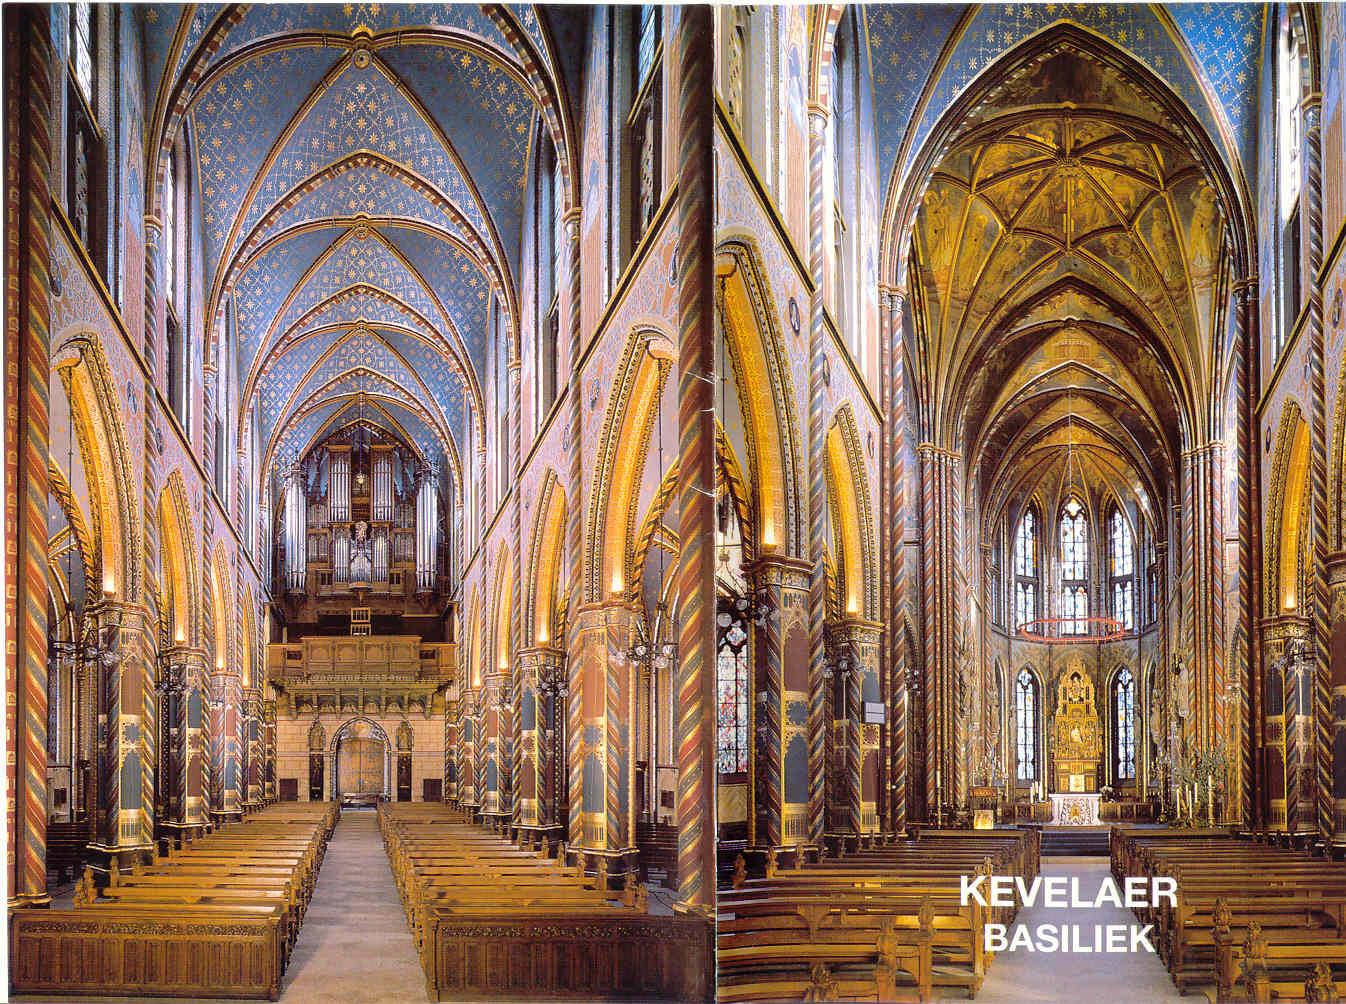 Basiliek Kevelaer